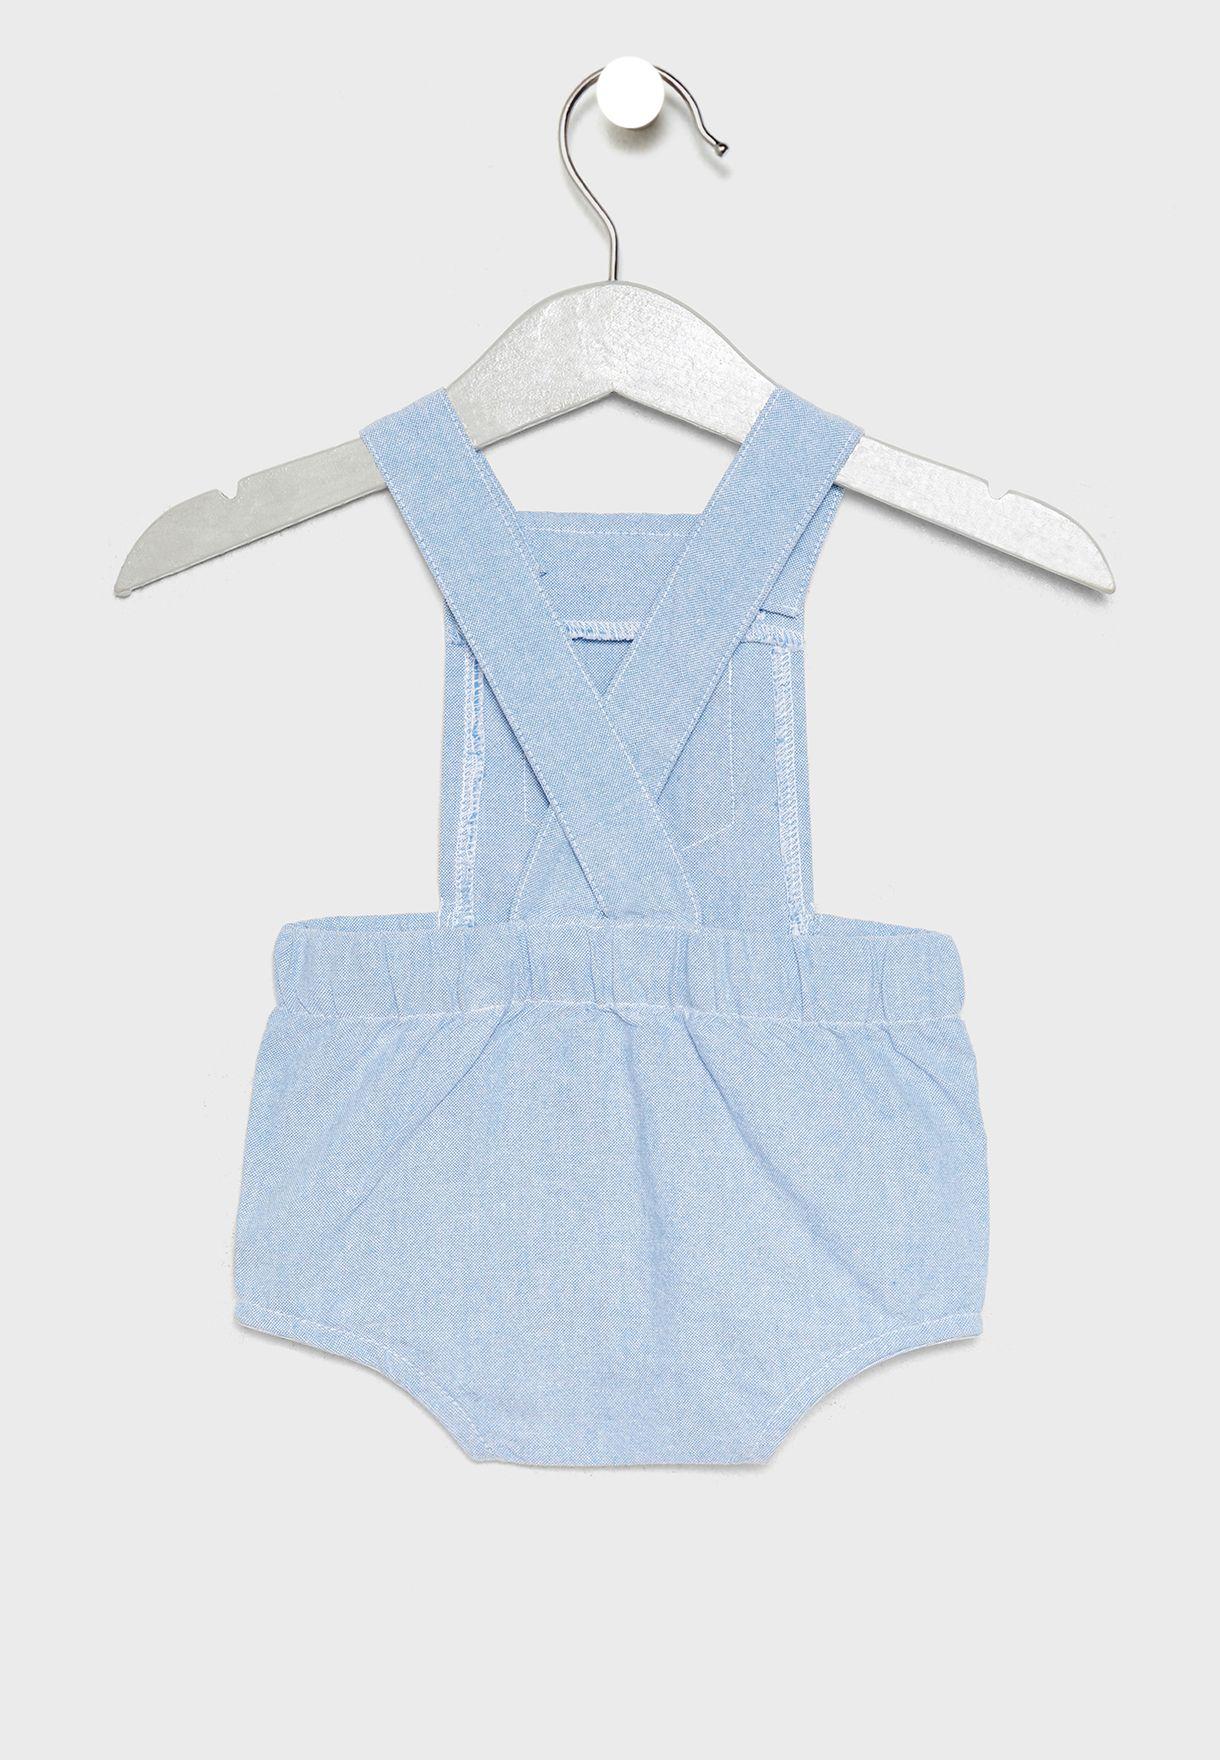 Infant T-Shirt + Bear Applique Dungaree + Socks Set